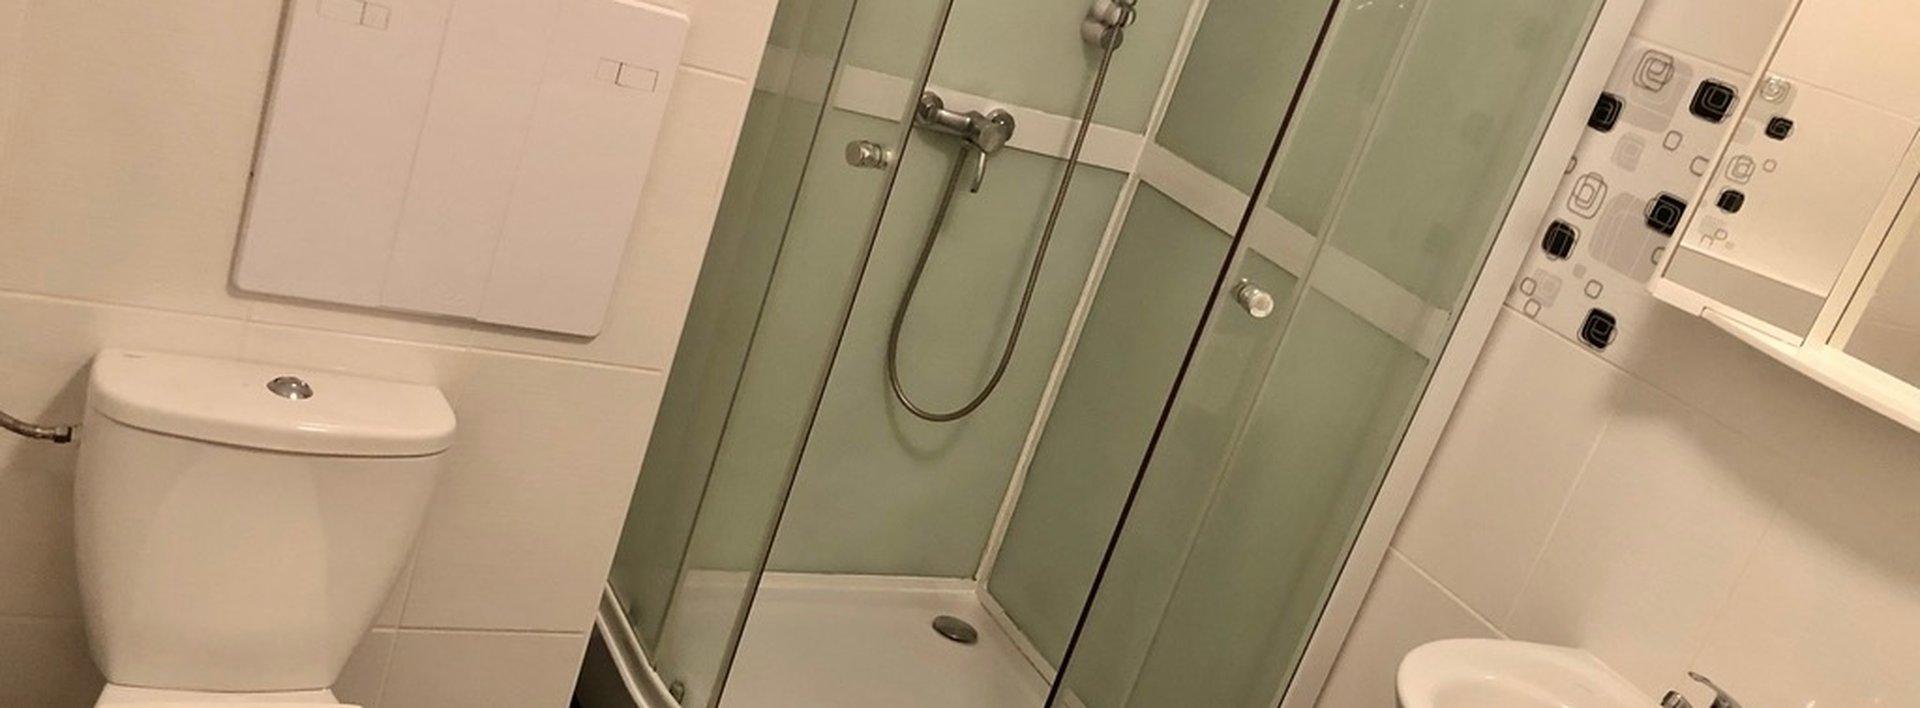 Prodej bytu 2+kk s lodžií, 47m² - Jablonec n/N., ul. Havlíčkova, Ev.č.: N48974